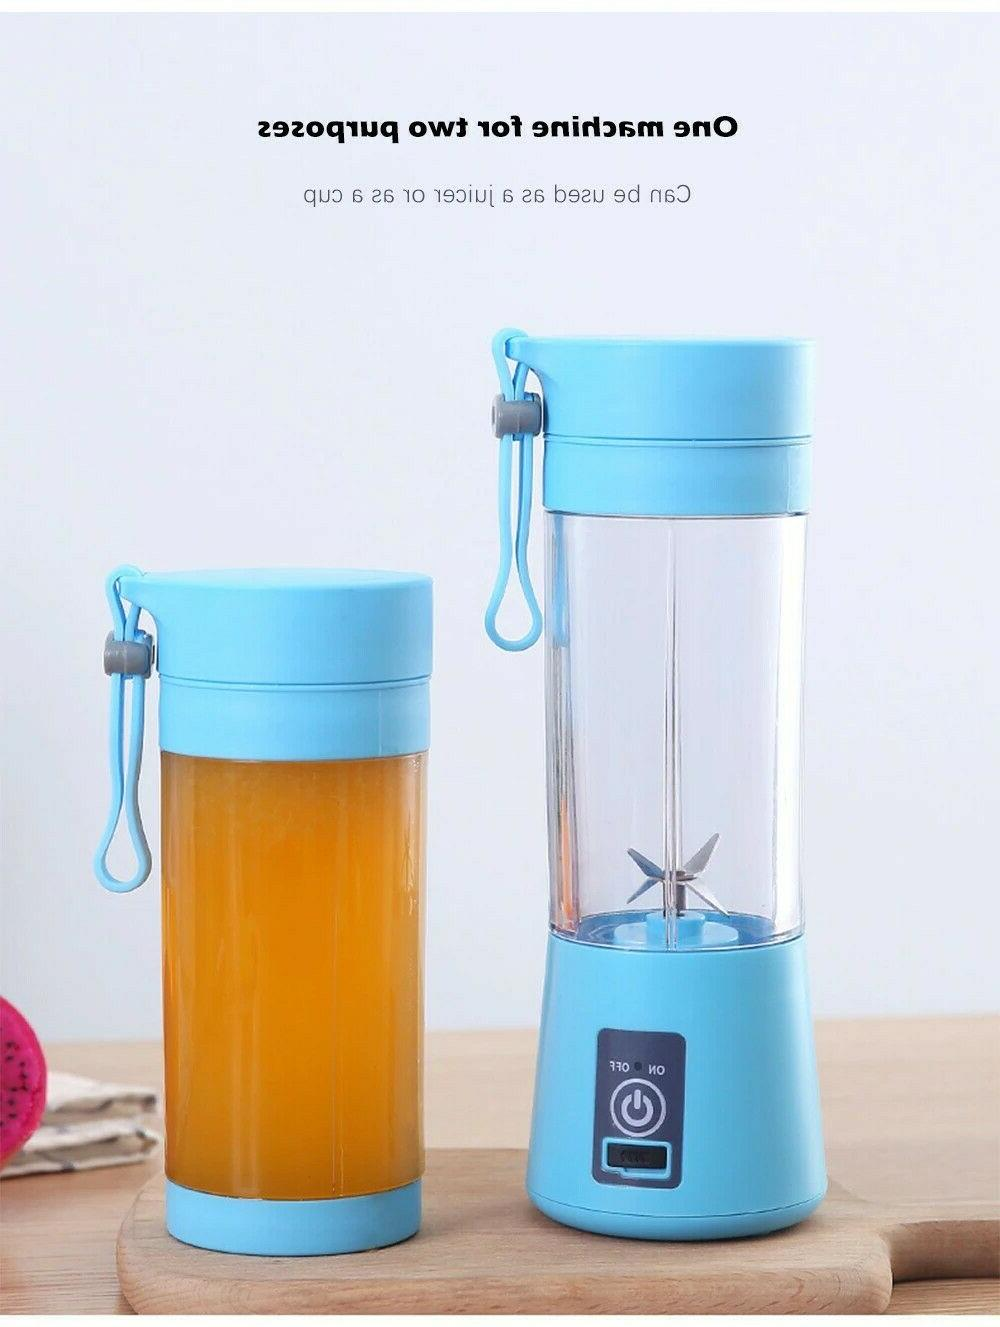 380ml Portable Blender Juicer Rechargeable